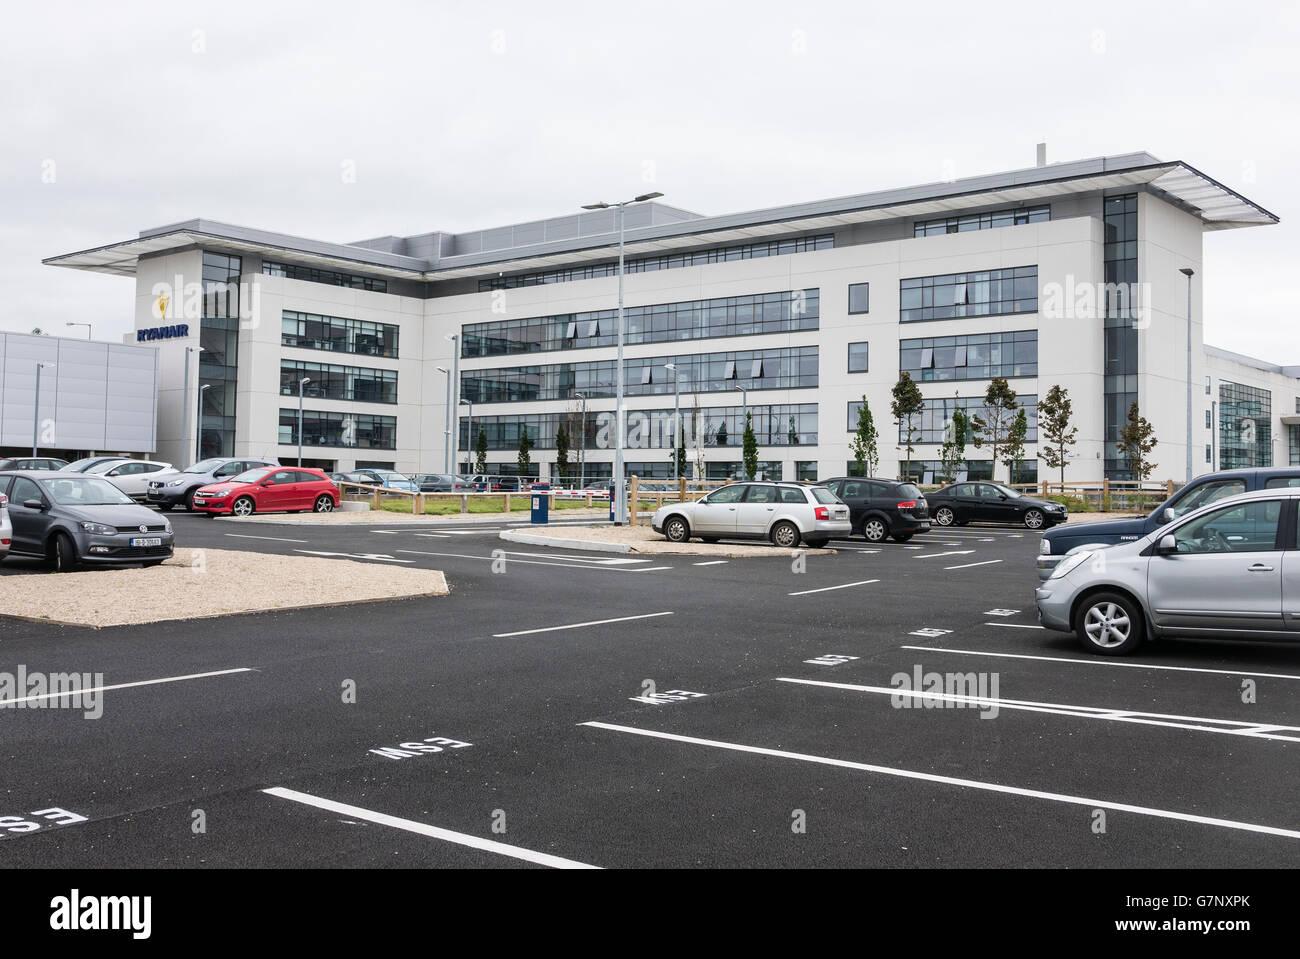 Ryanair Ltd Corporate Head Office building. Airside Business Park, Swords, Co. Dublin,Ireland - Stock Image